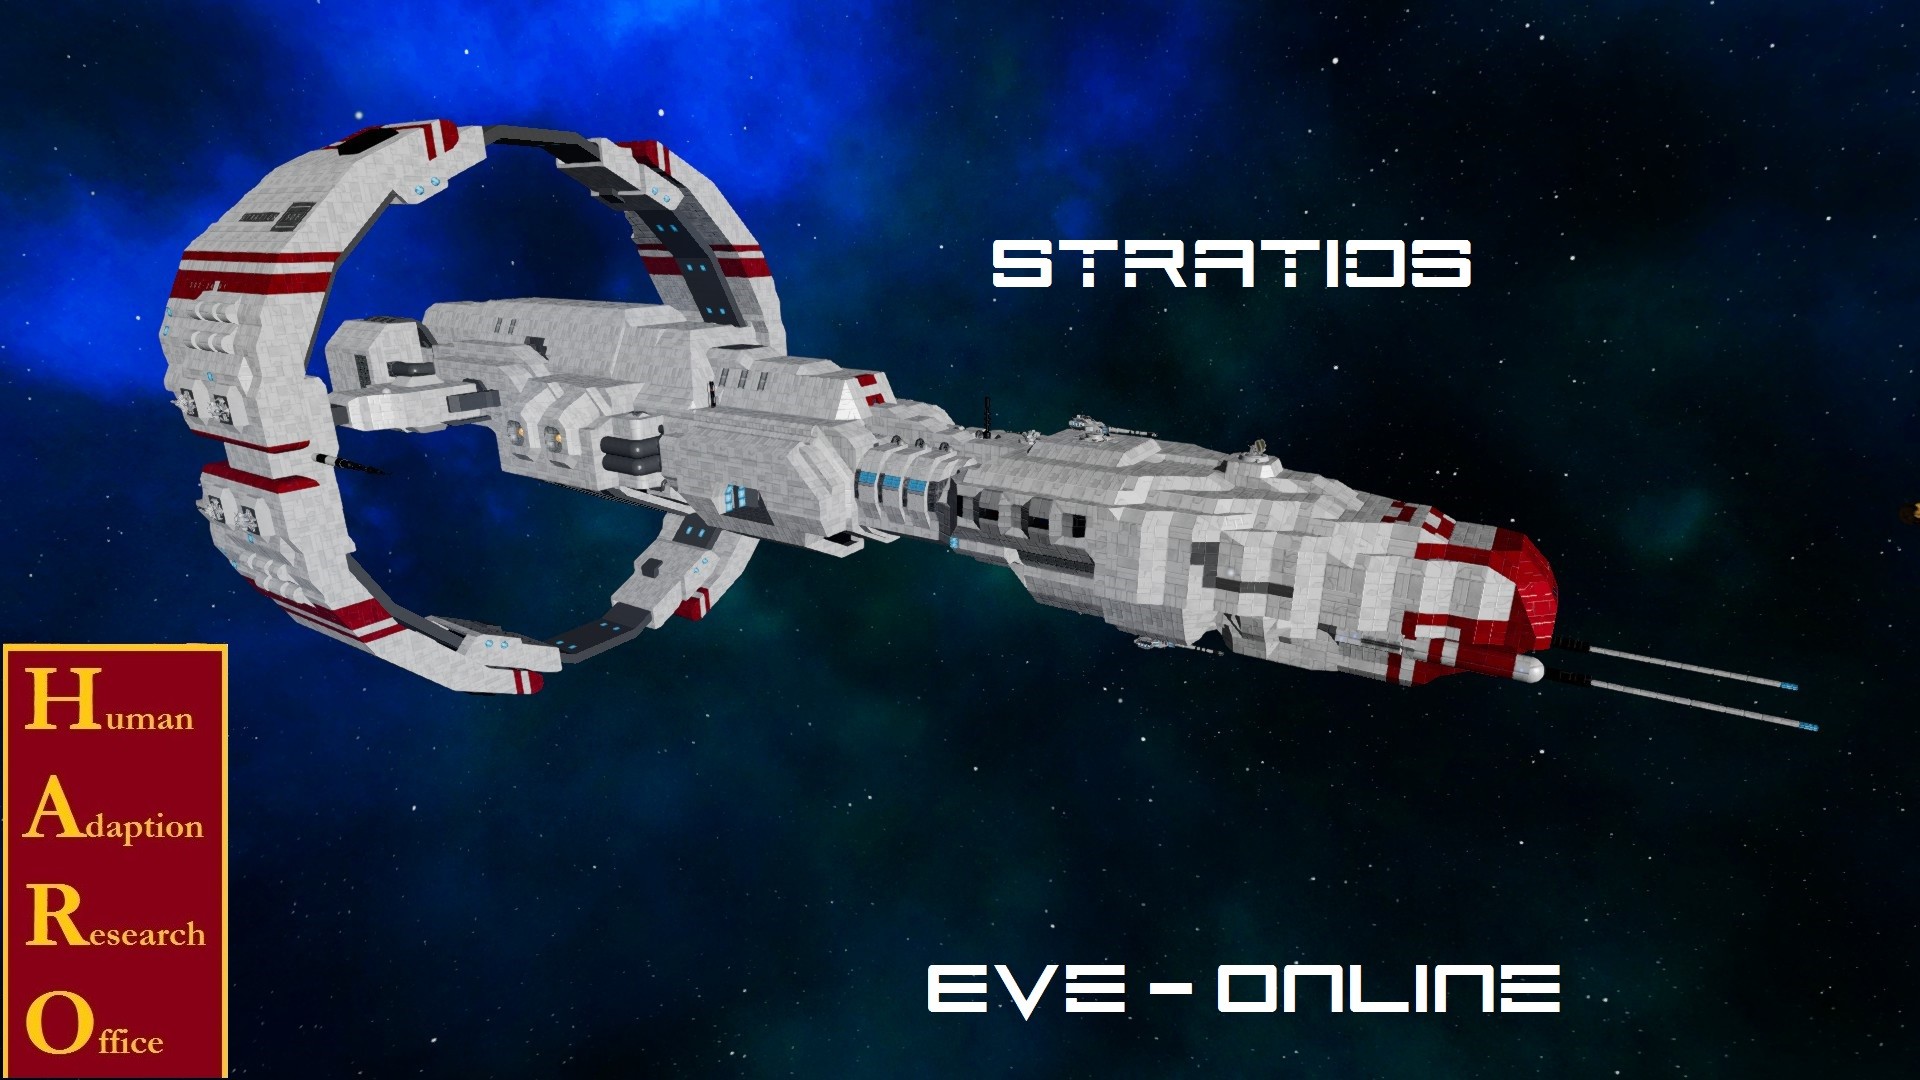 Eve Online Stratios